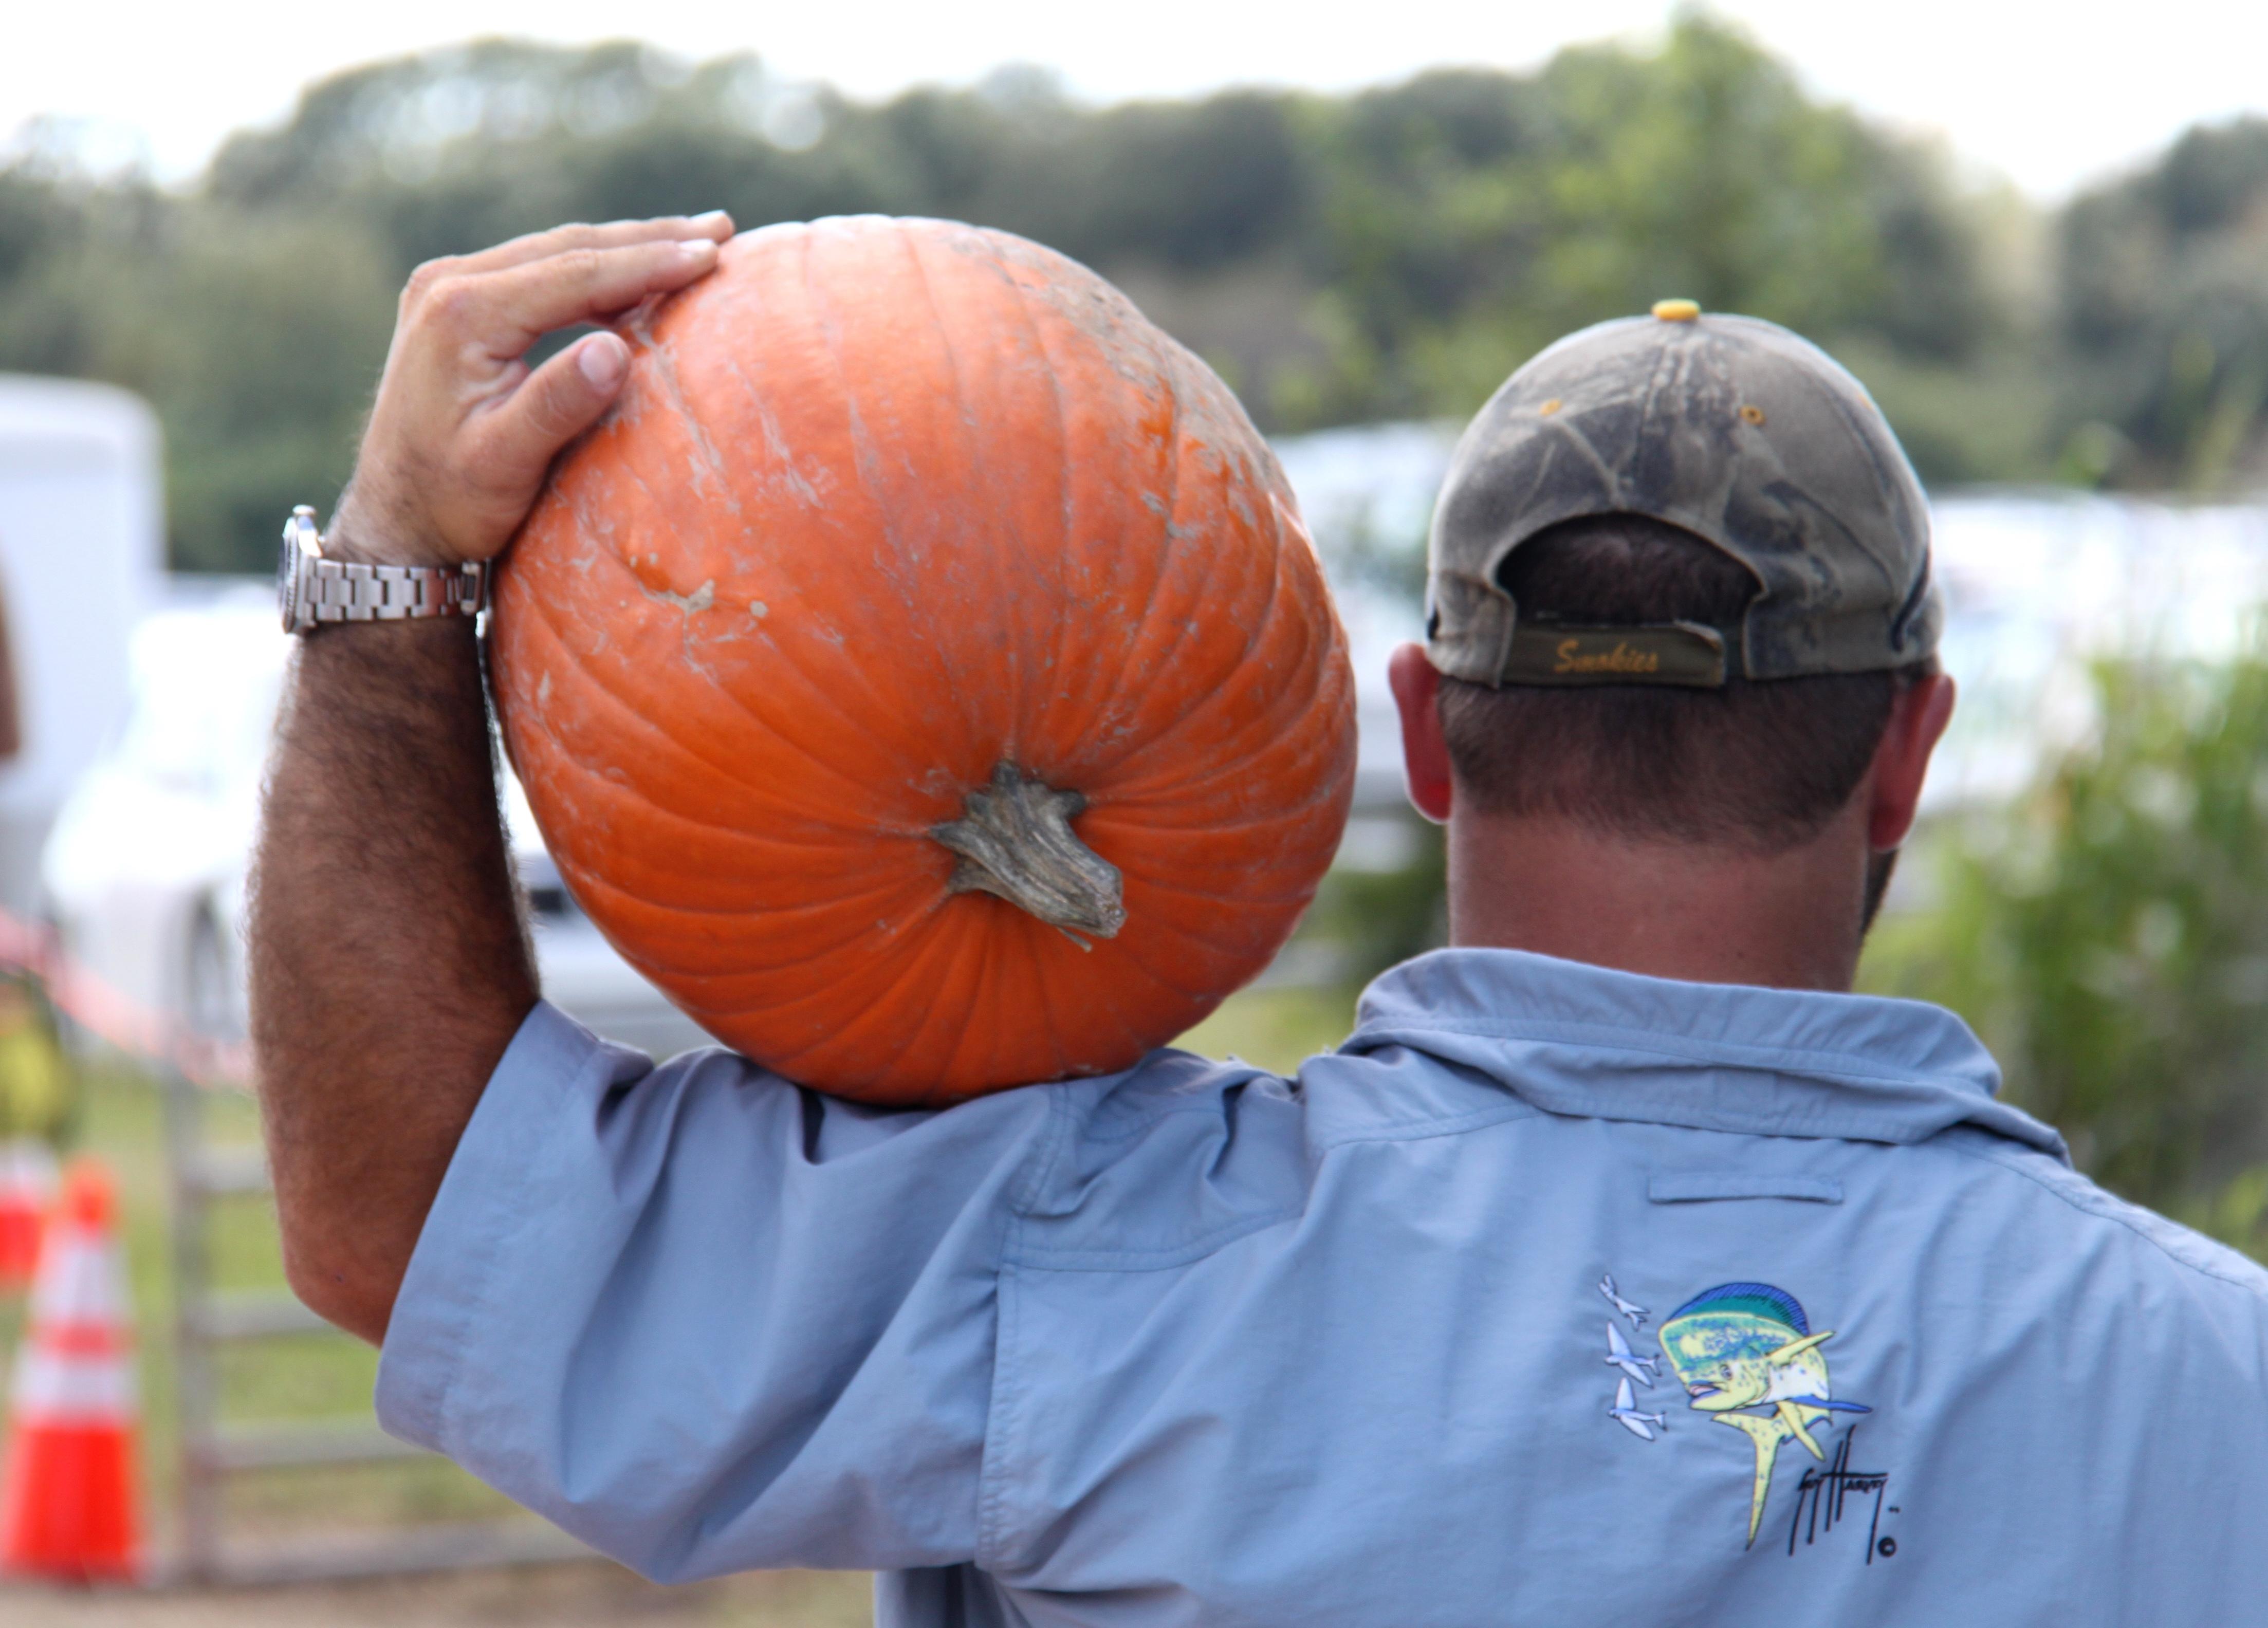 Hunsader Farms Pumpkin Festival